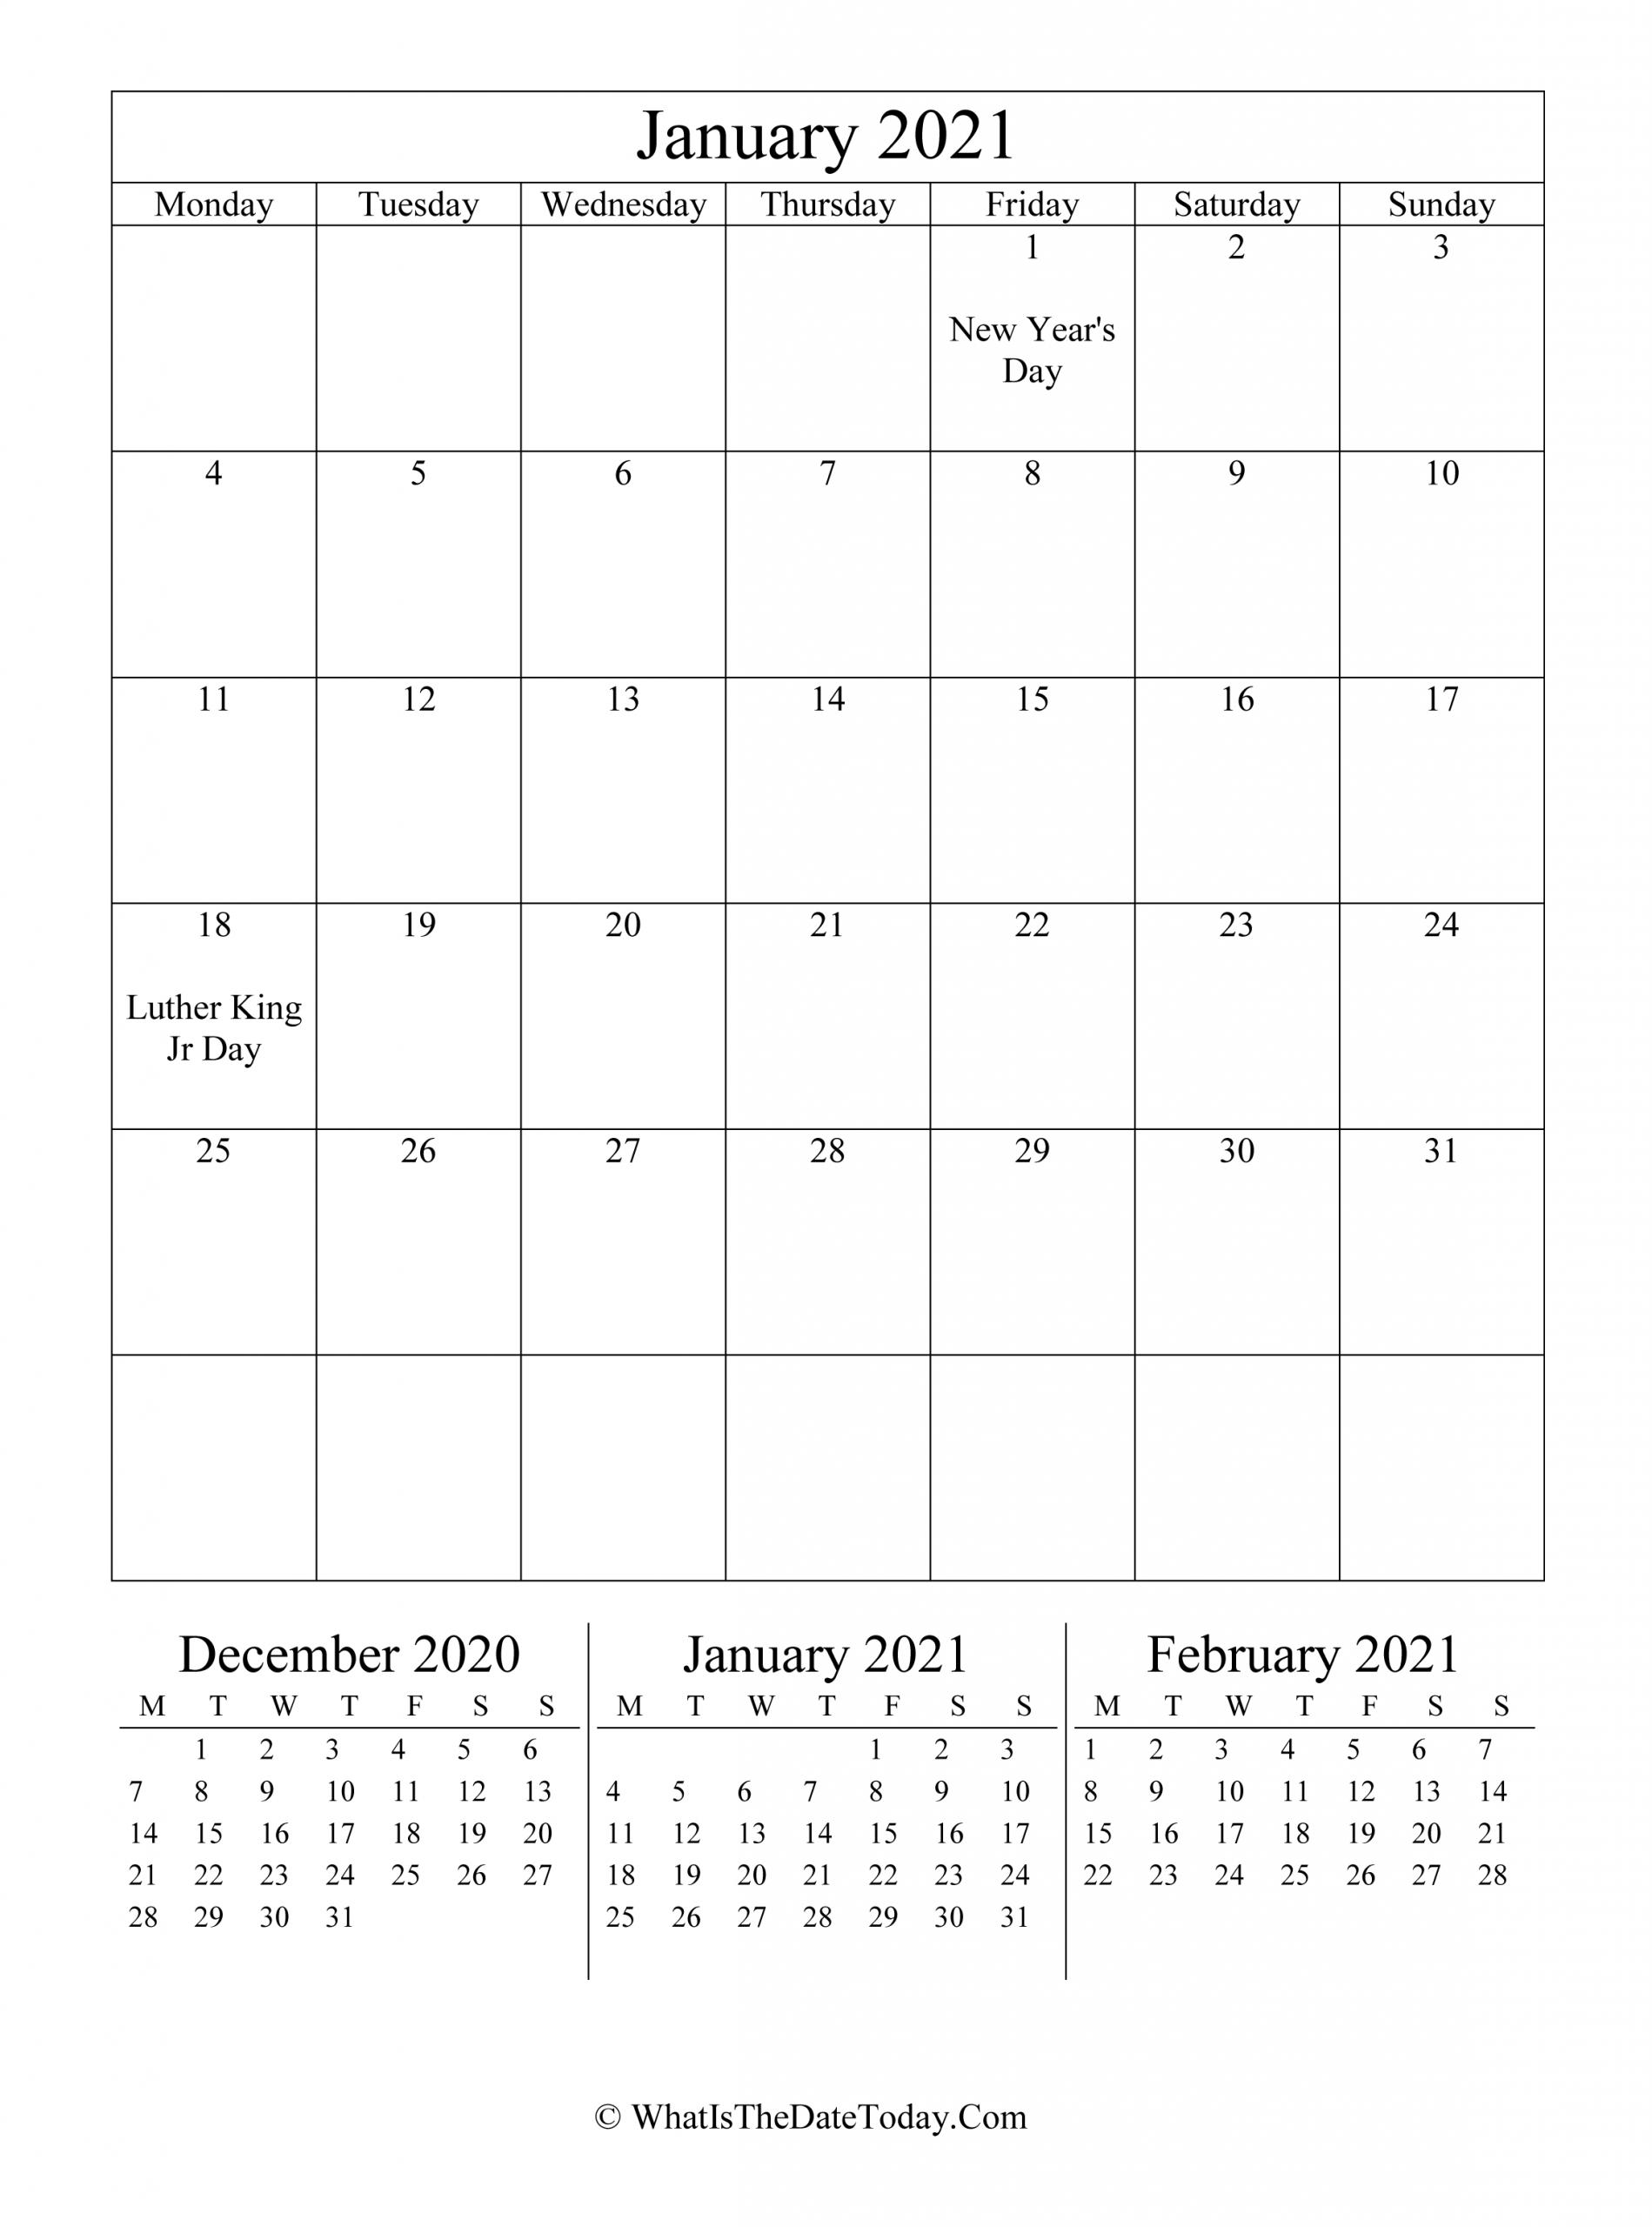 January 2021 Editable Calendar (Vertical Layout